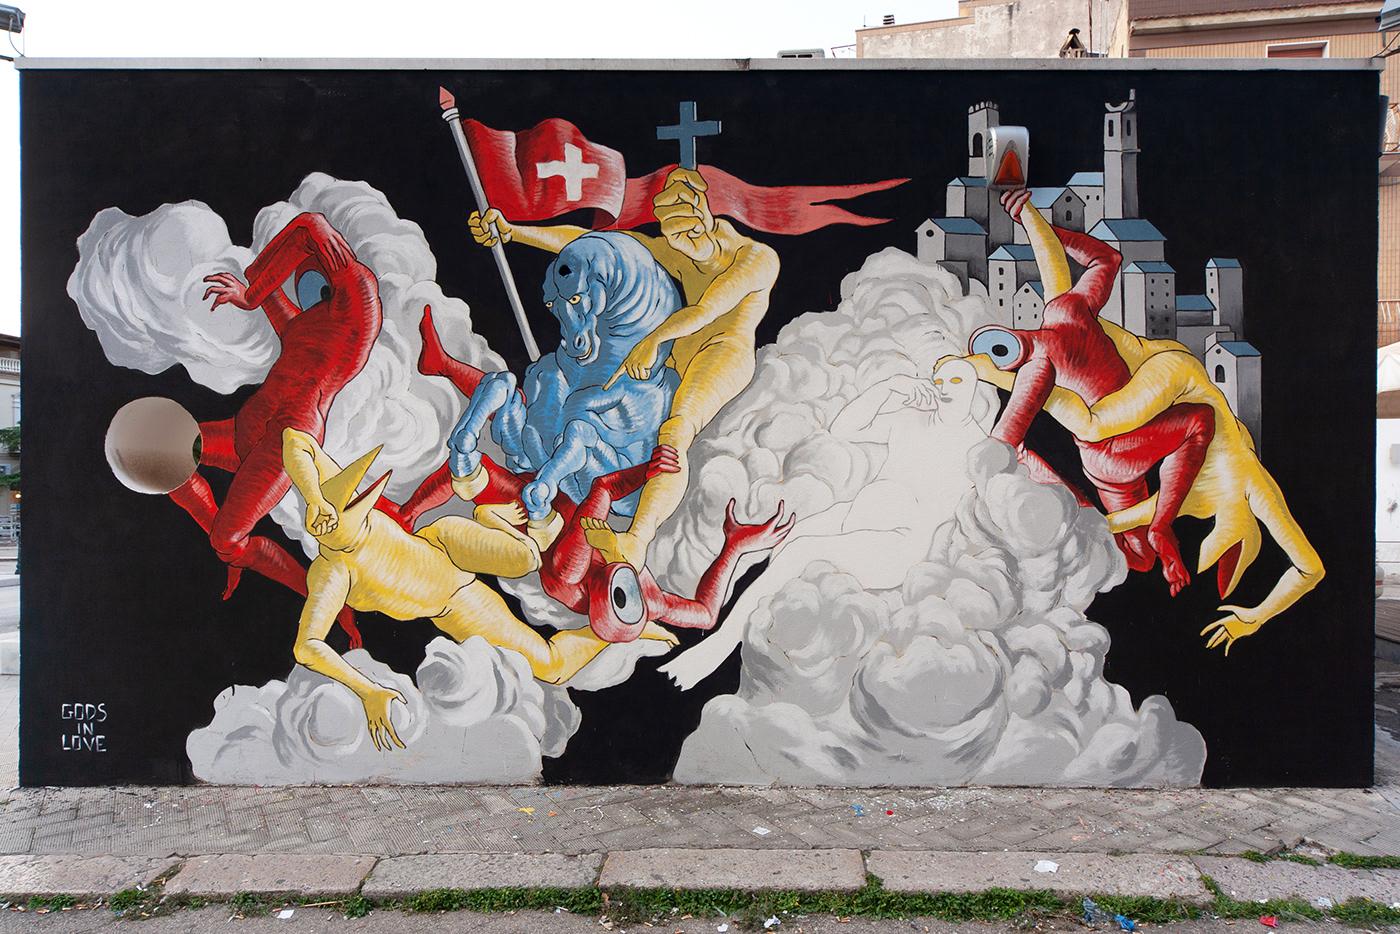 art Character design  contemporary handmade illustrations Mural MURALISMO painting   streetart wall